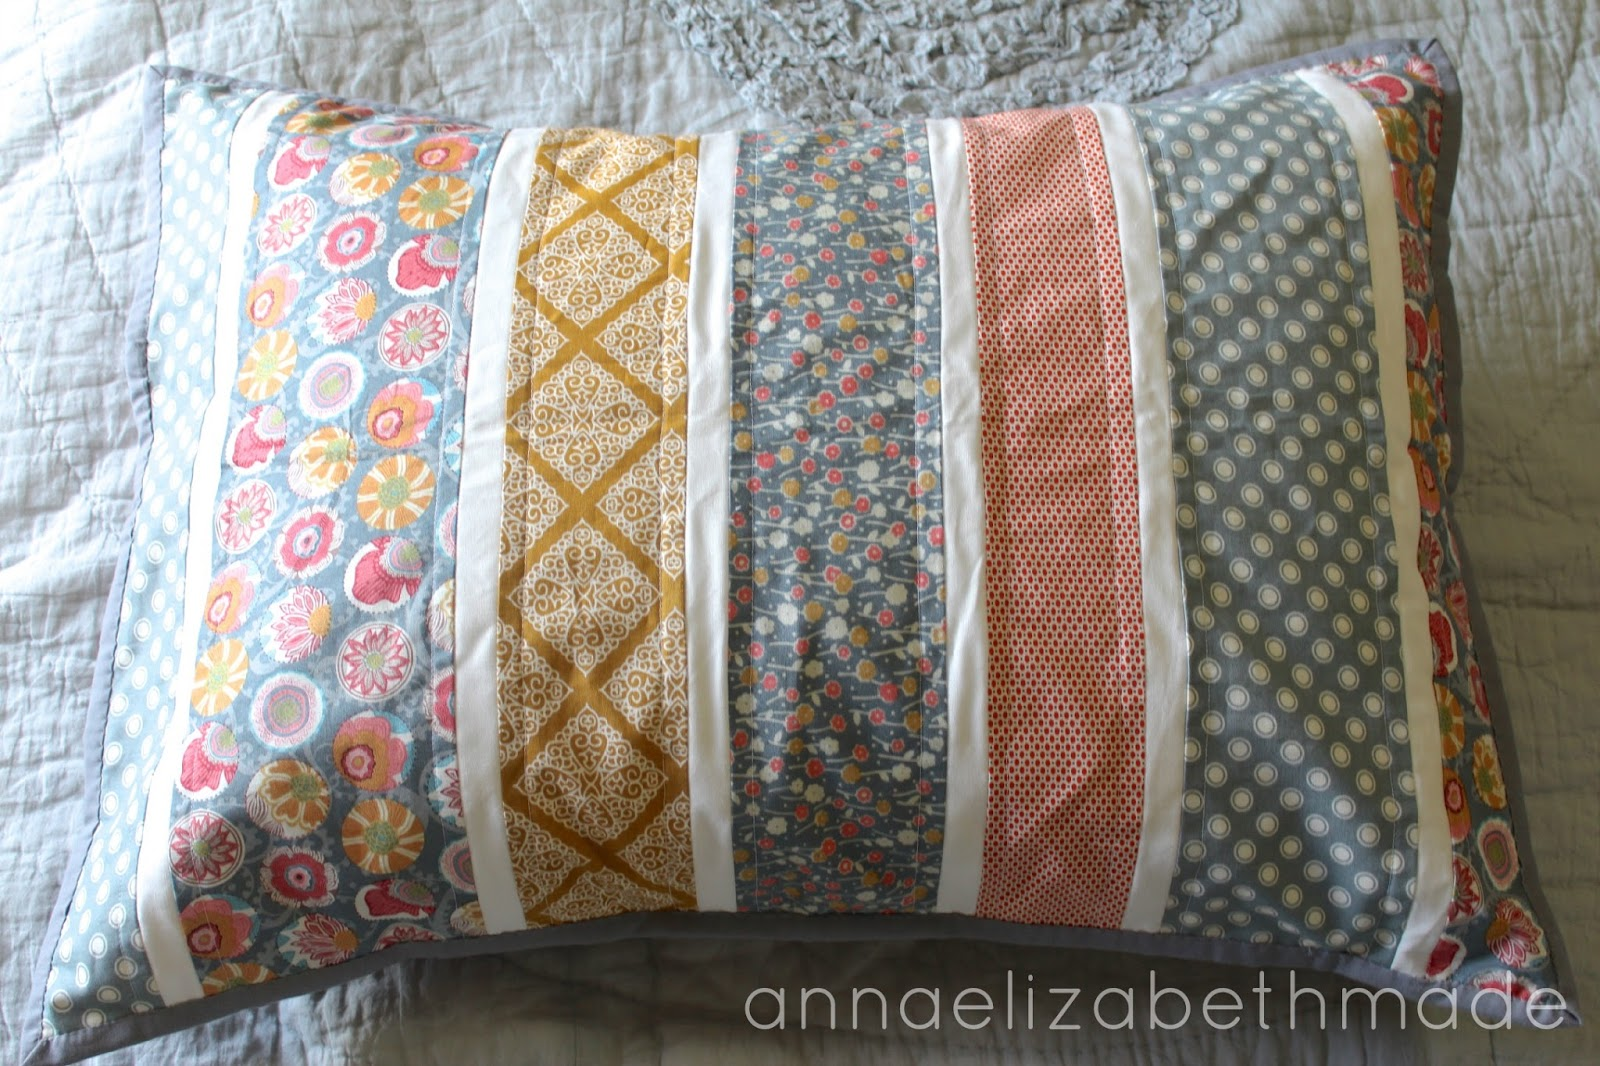 anna elizabeth made quilted pillow sham tutorial. Black Bedroom Furniture Sets. Home Design Ideas